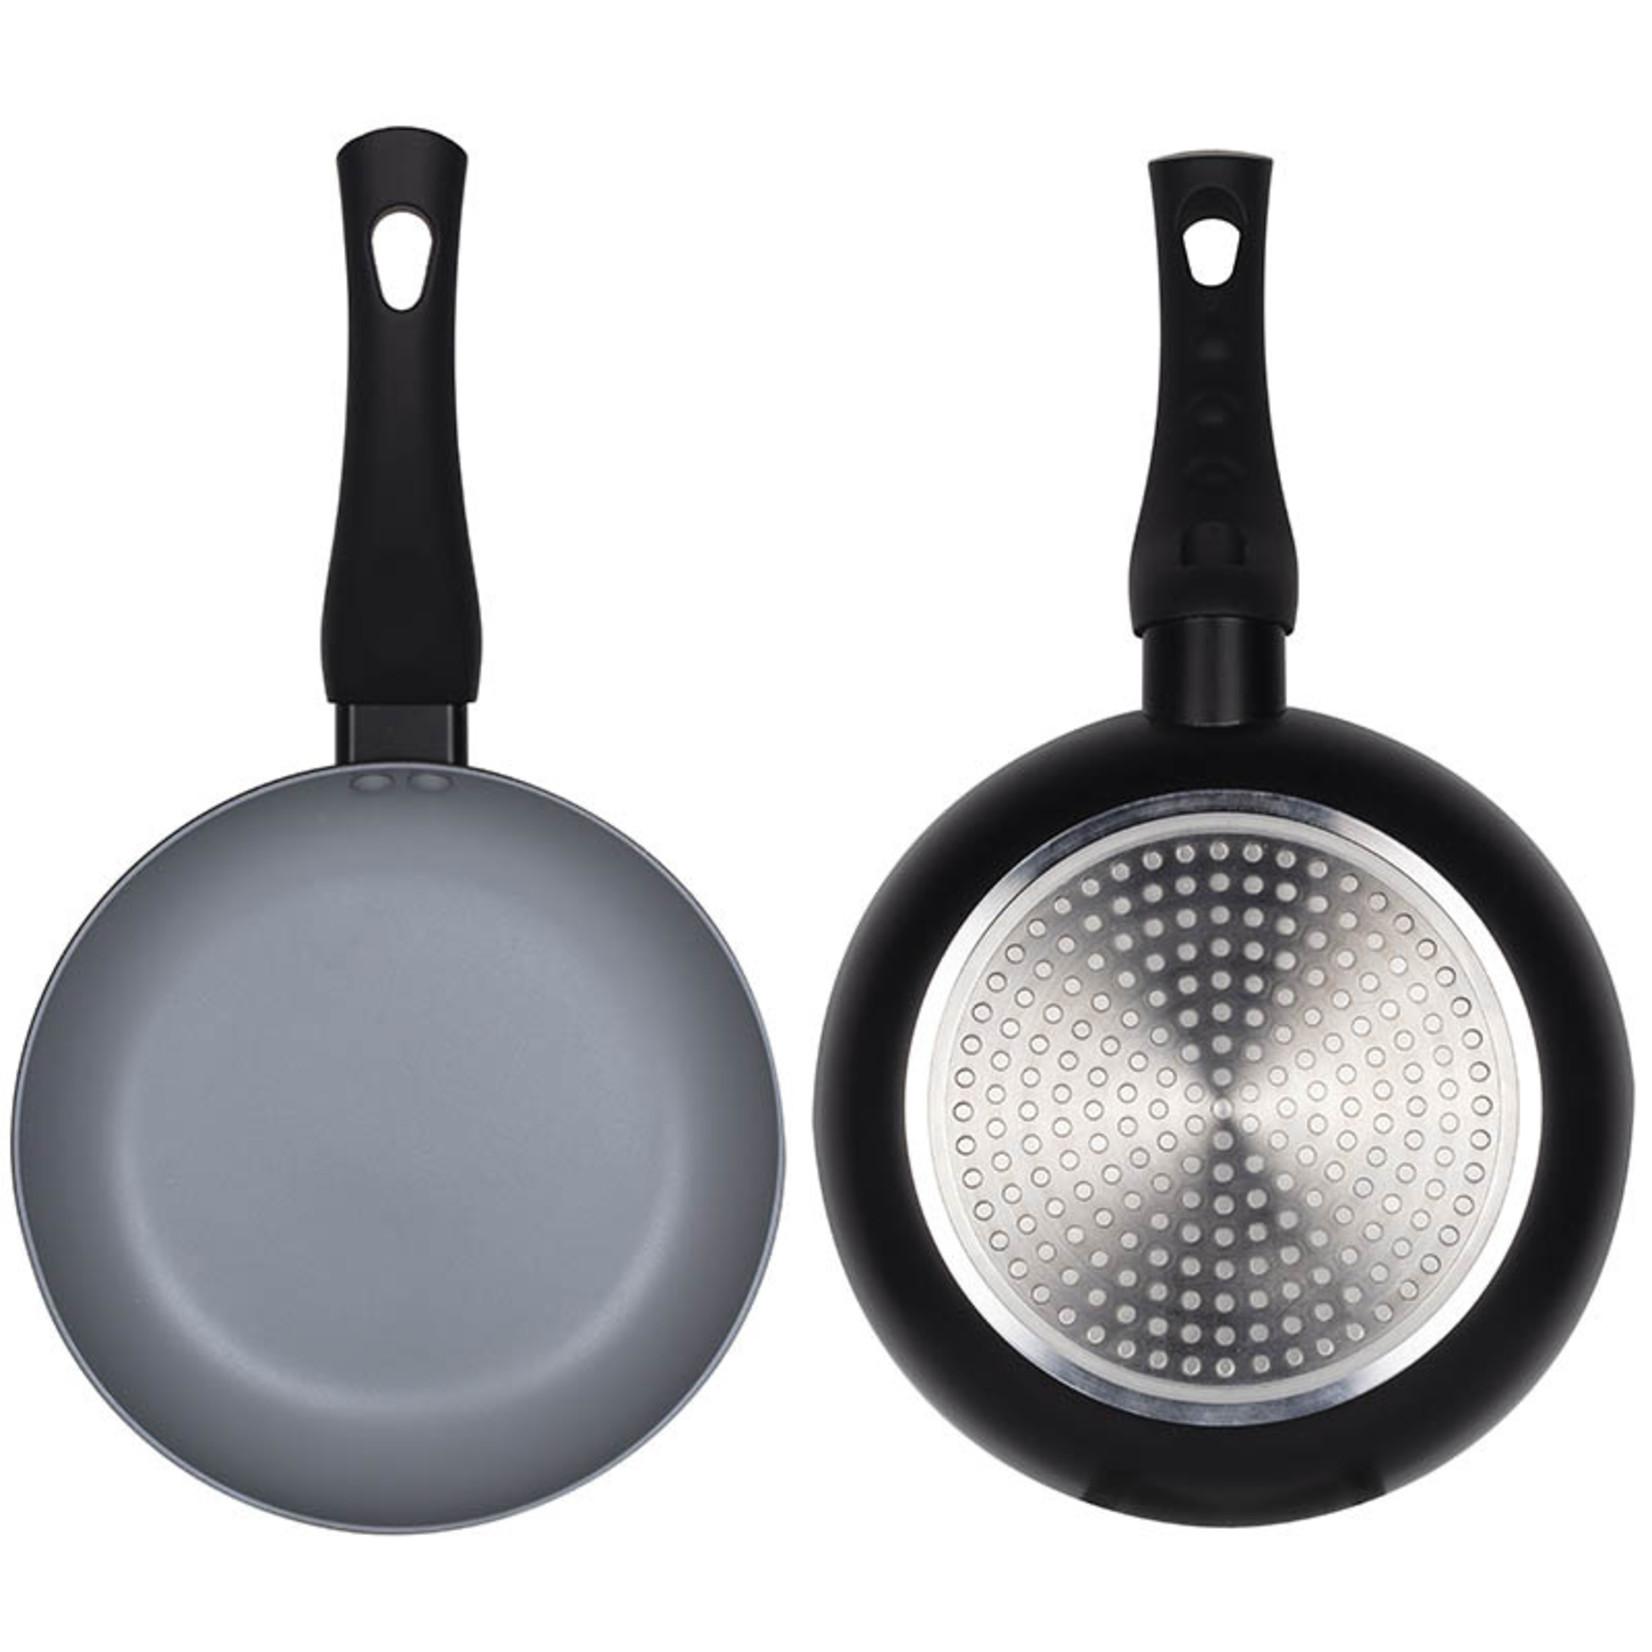 Renberg Koekenpannenset Selene - inductie